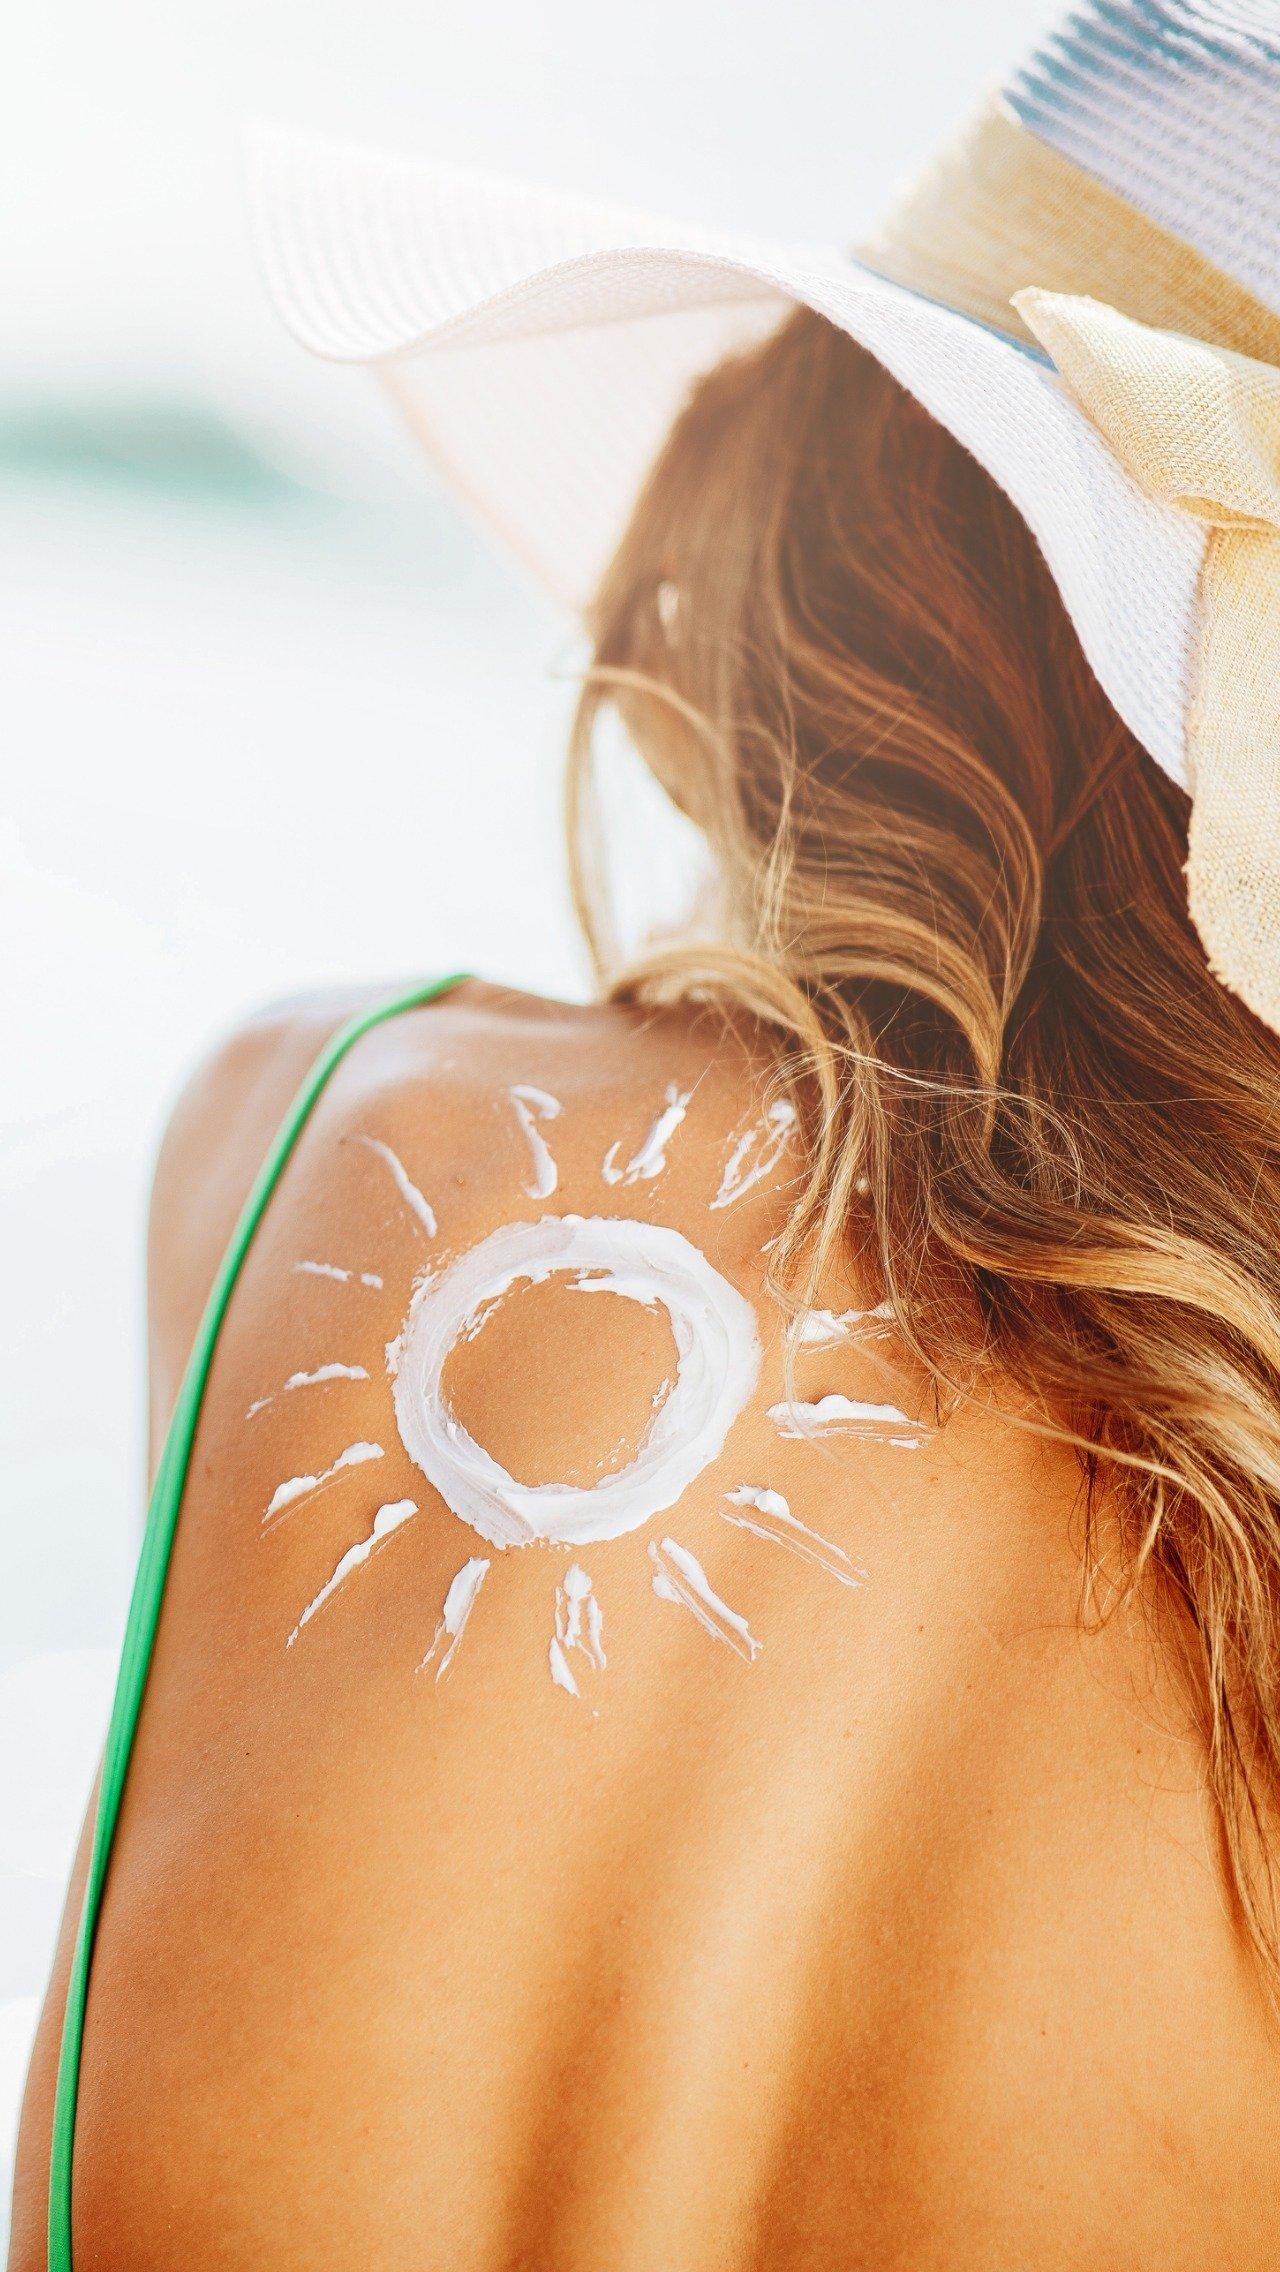 Как не обгореть на солнце?